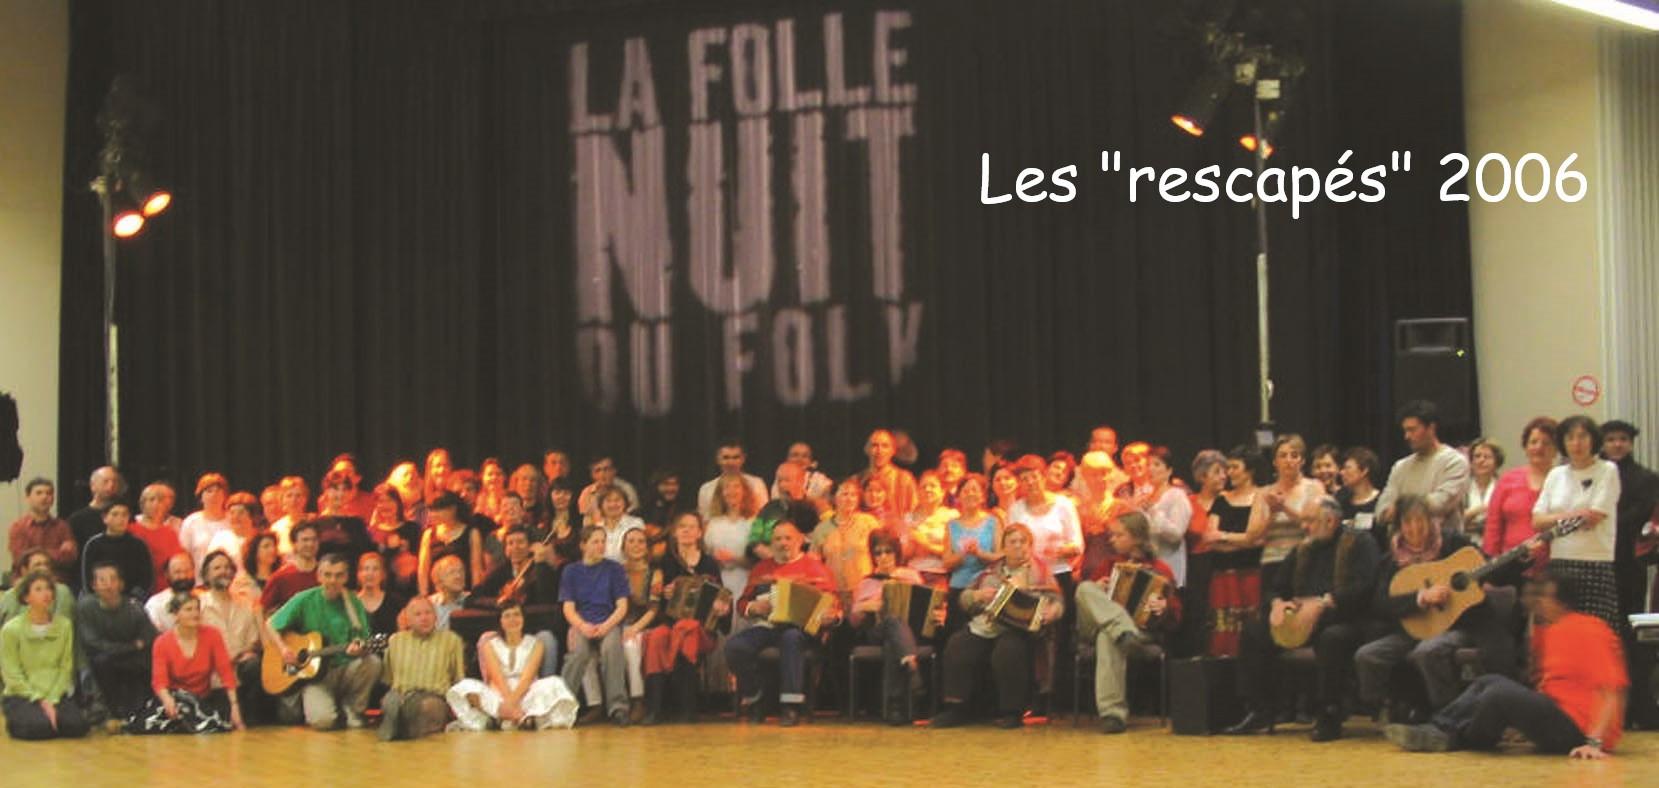 Rescapés Folle Nuit du Folk 2006